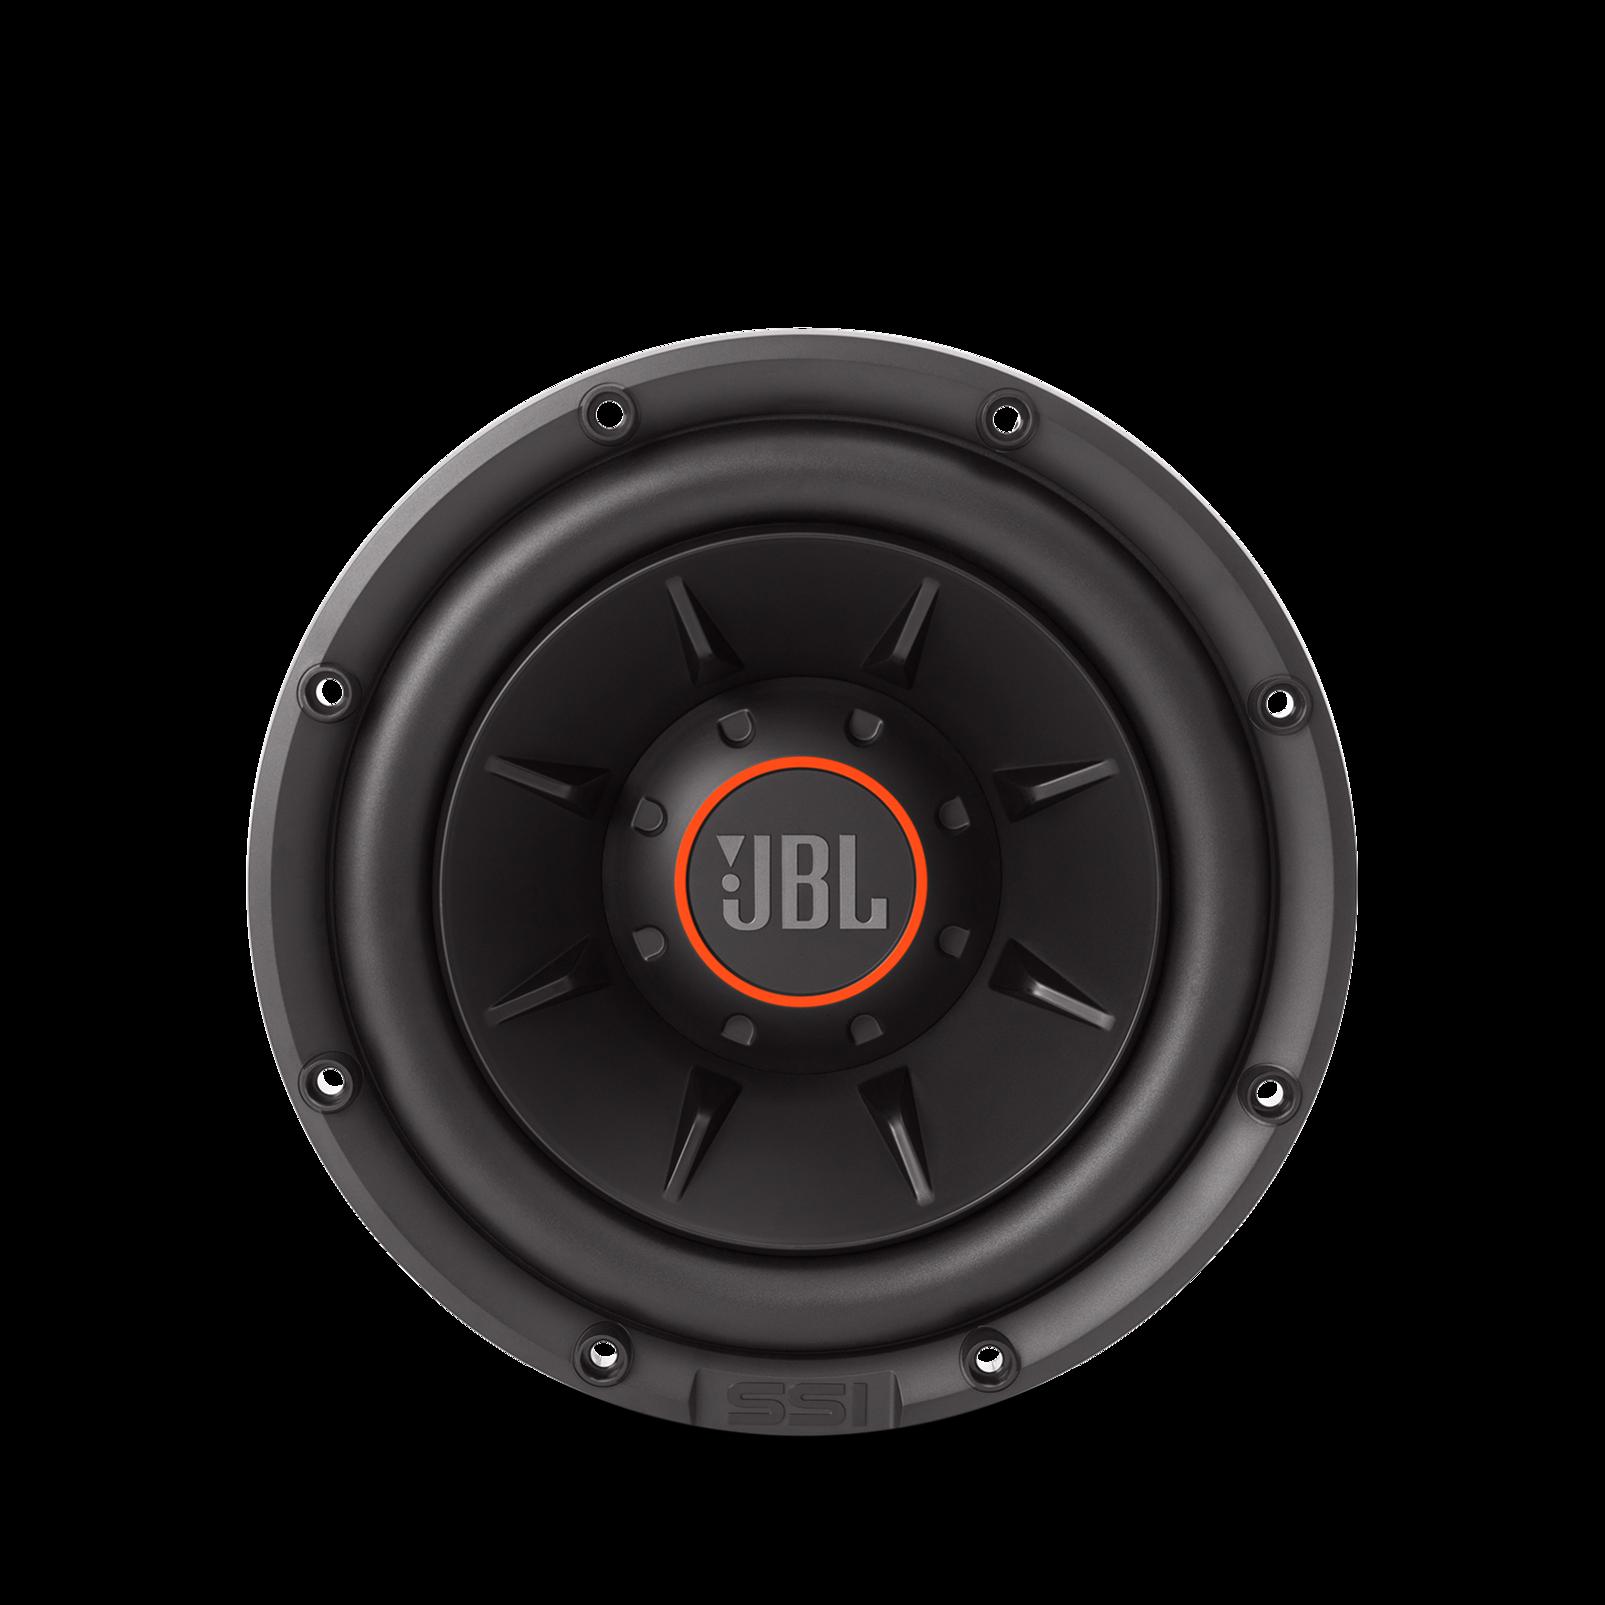 s2 1024 10 car audio subwoofers. Black Bedroom Furniture Sets. Home Design Ideas